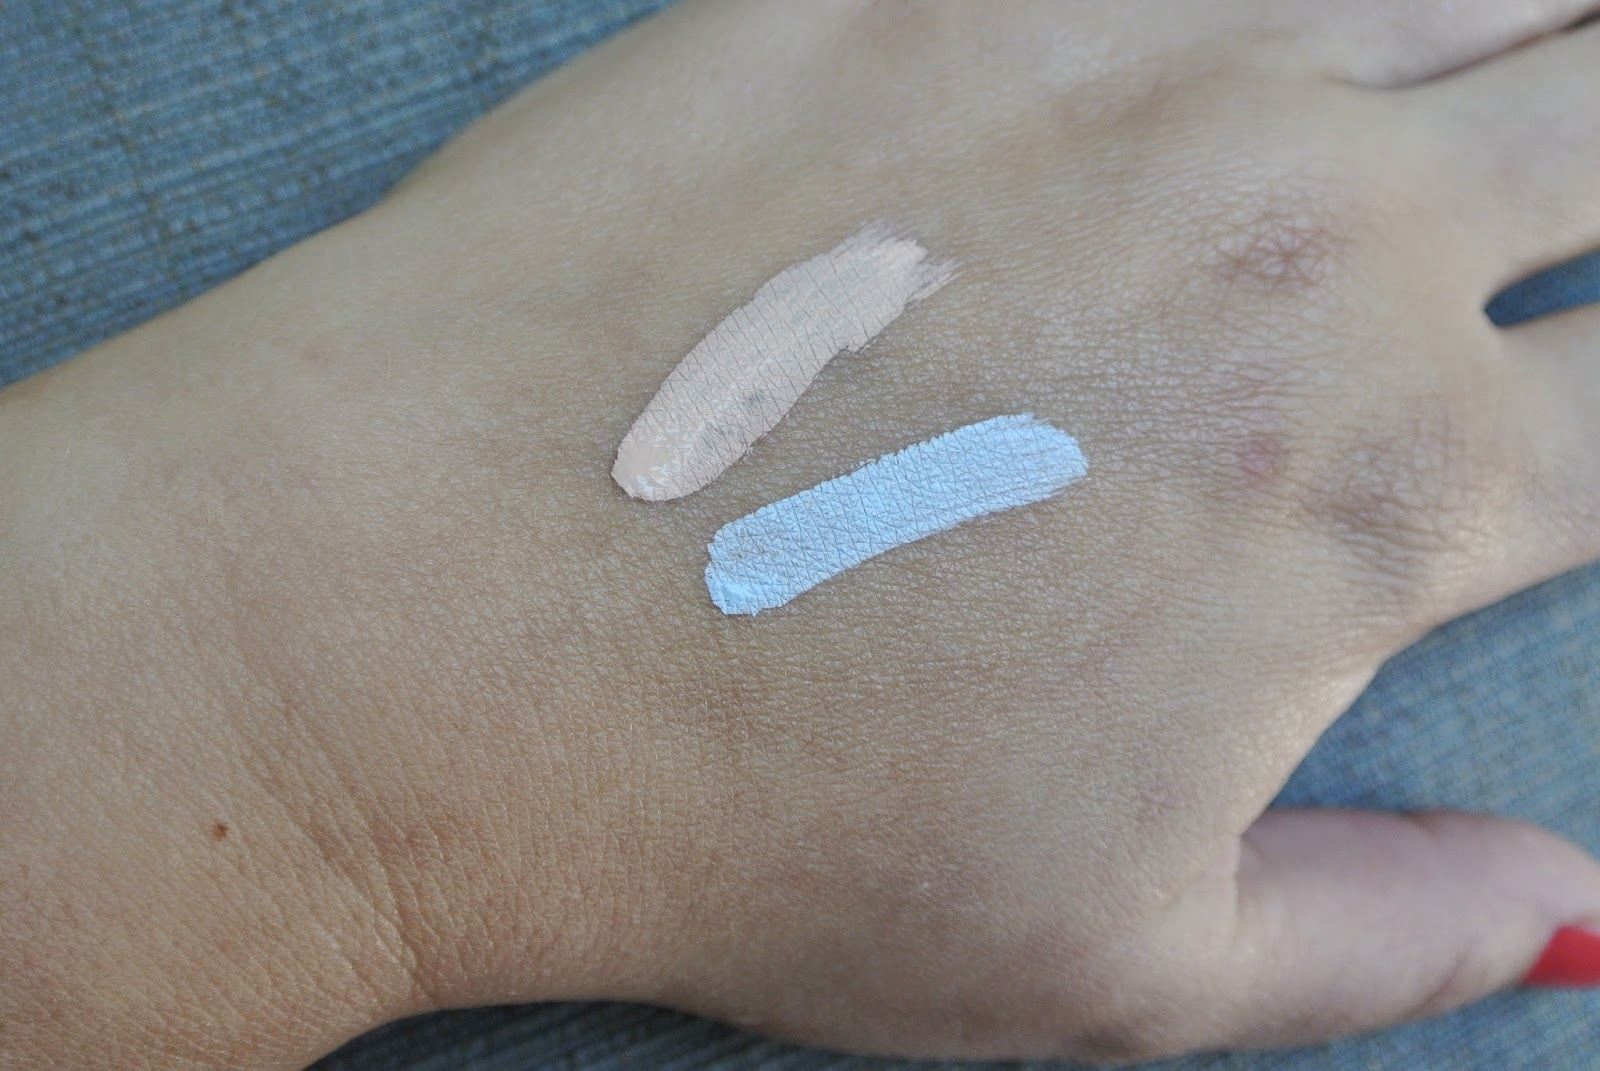 Hand swatches of Laura Mercier Eye Basics in Linen (top) and Eyebright (bottom)